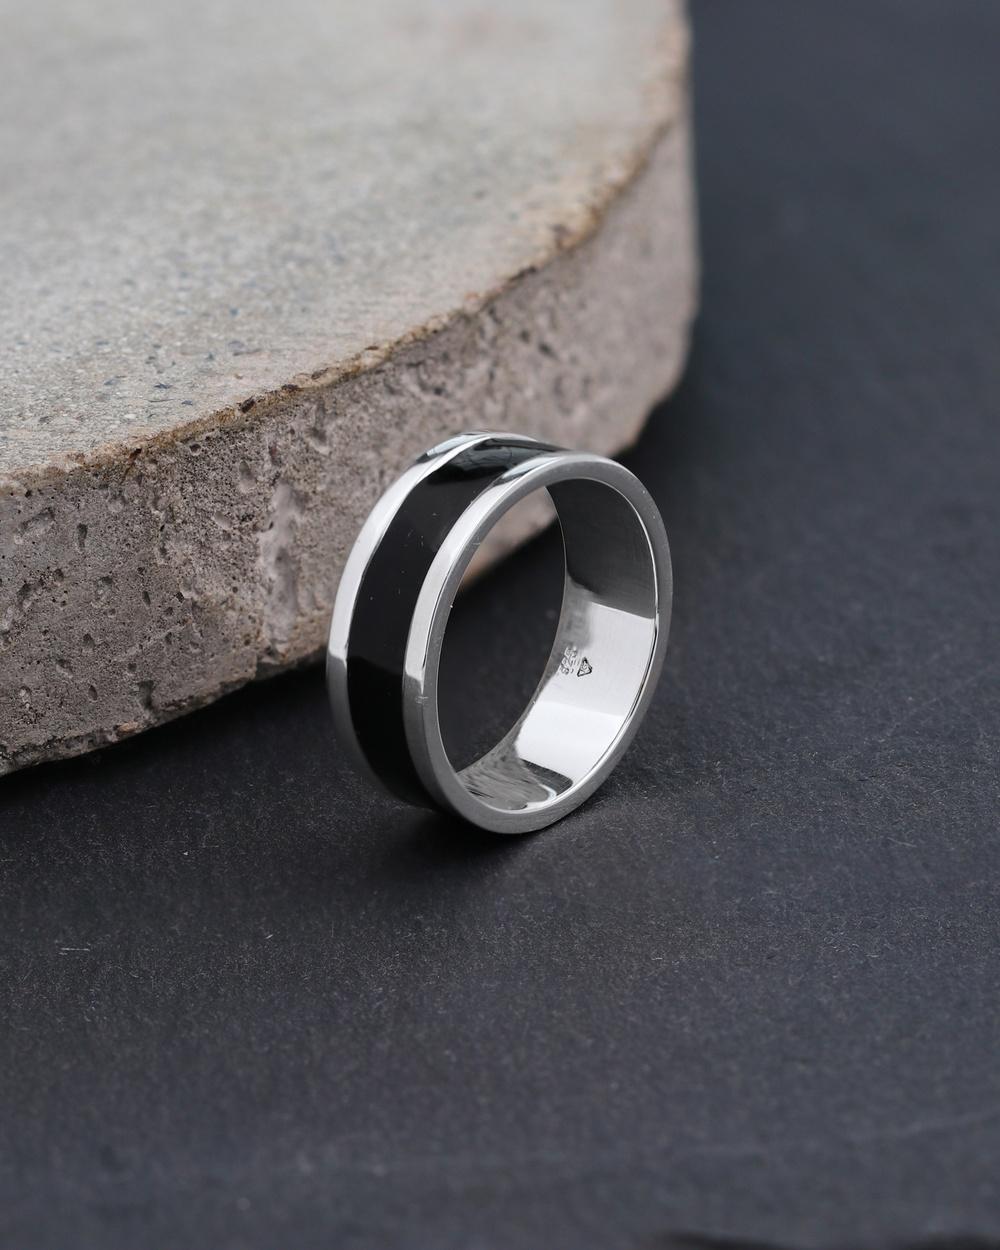 Kuzzoi Ring Basic Geo Black Enamel Cool 925 Sterling Silver Watches Silver